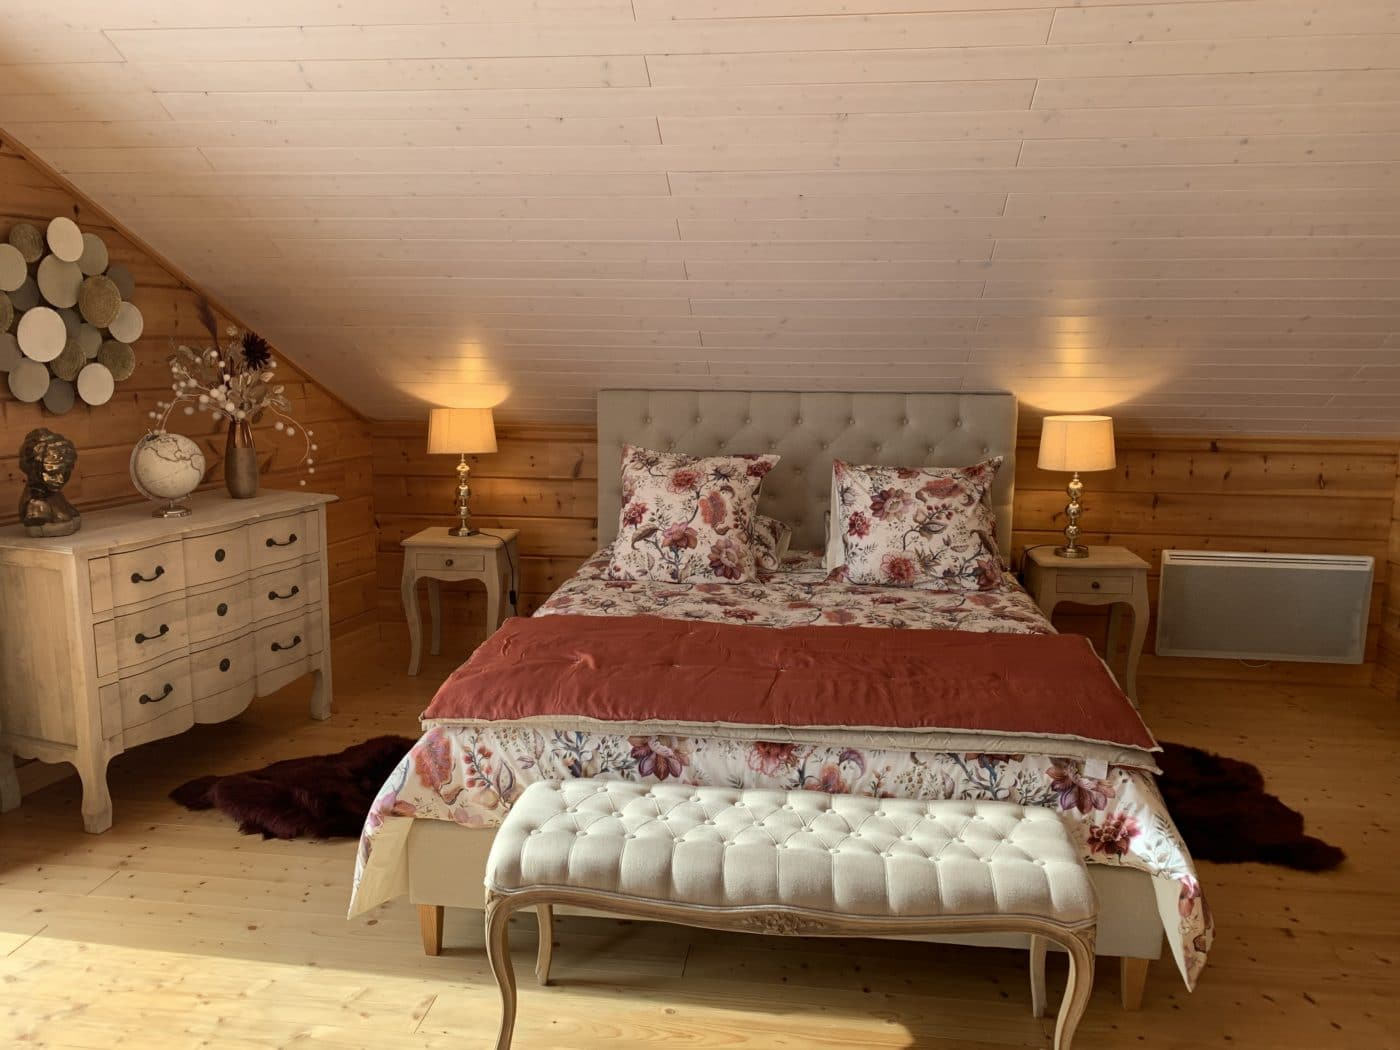 La Pouilly03-chambre d'hote-o-refuge-divin-bannay-sancerre-cher